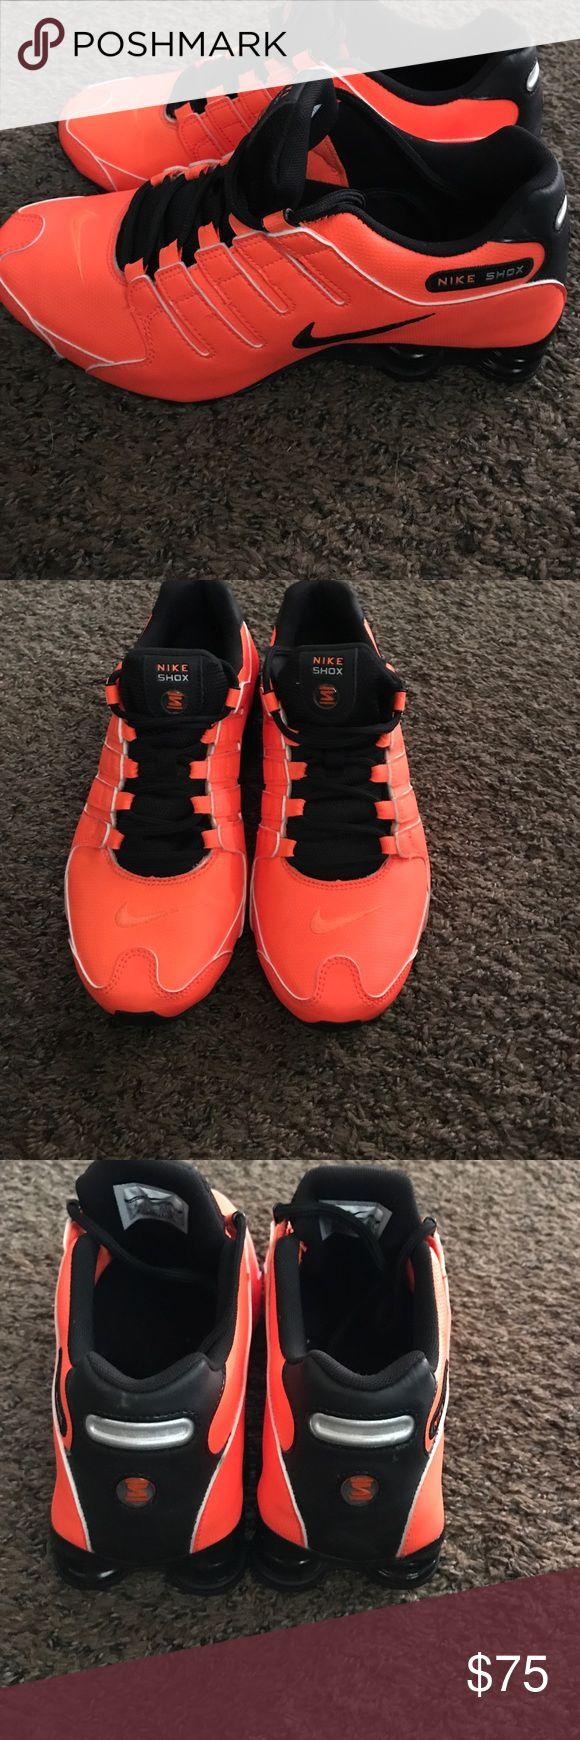 Nike shox Vibrant orange and black Nike Shox without box new never worn .... beautiful shoe nike shox  Shoes Sneakers